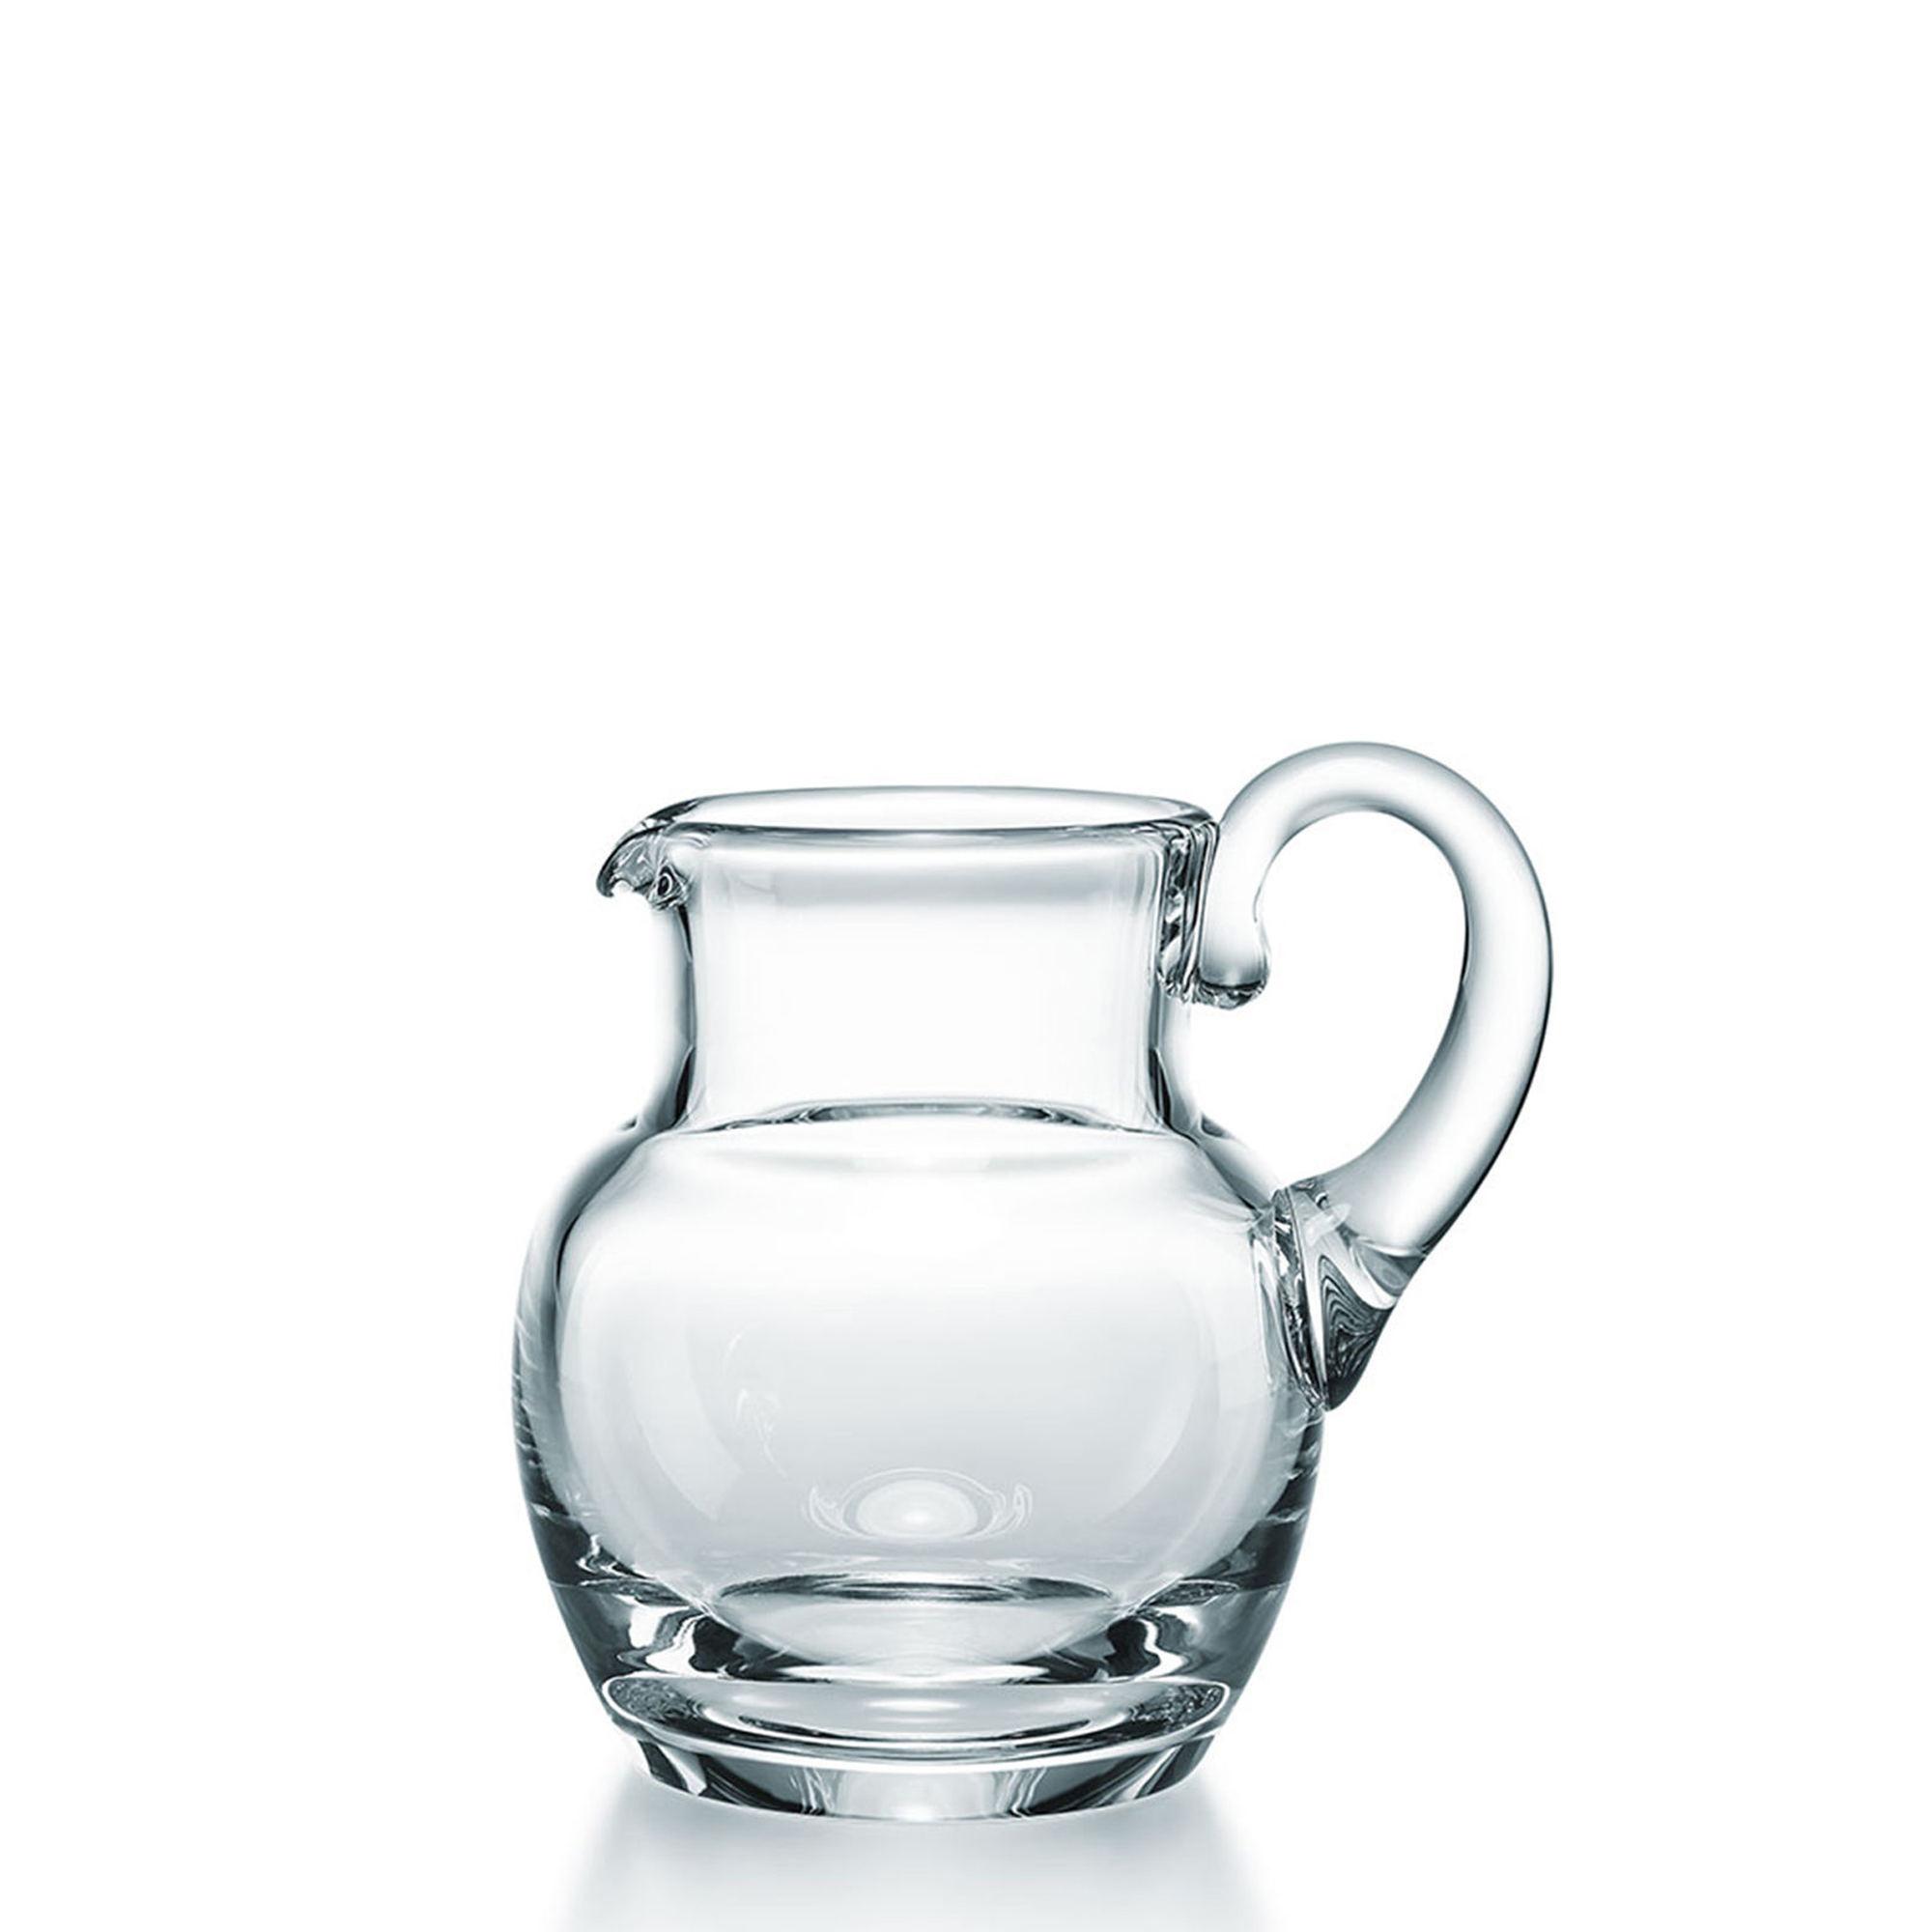 Baccarat BROCCA TRASPARENTE MOSAIQUE pitcher 2811238